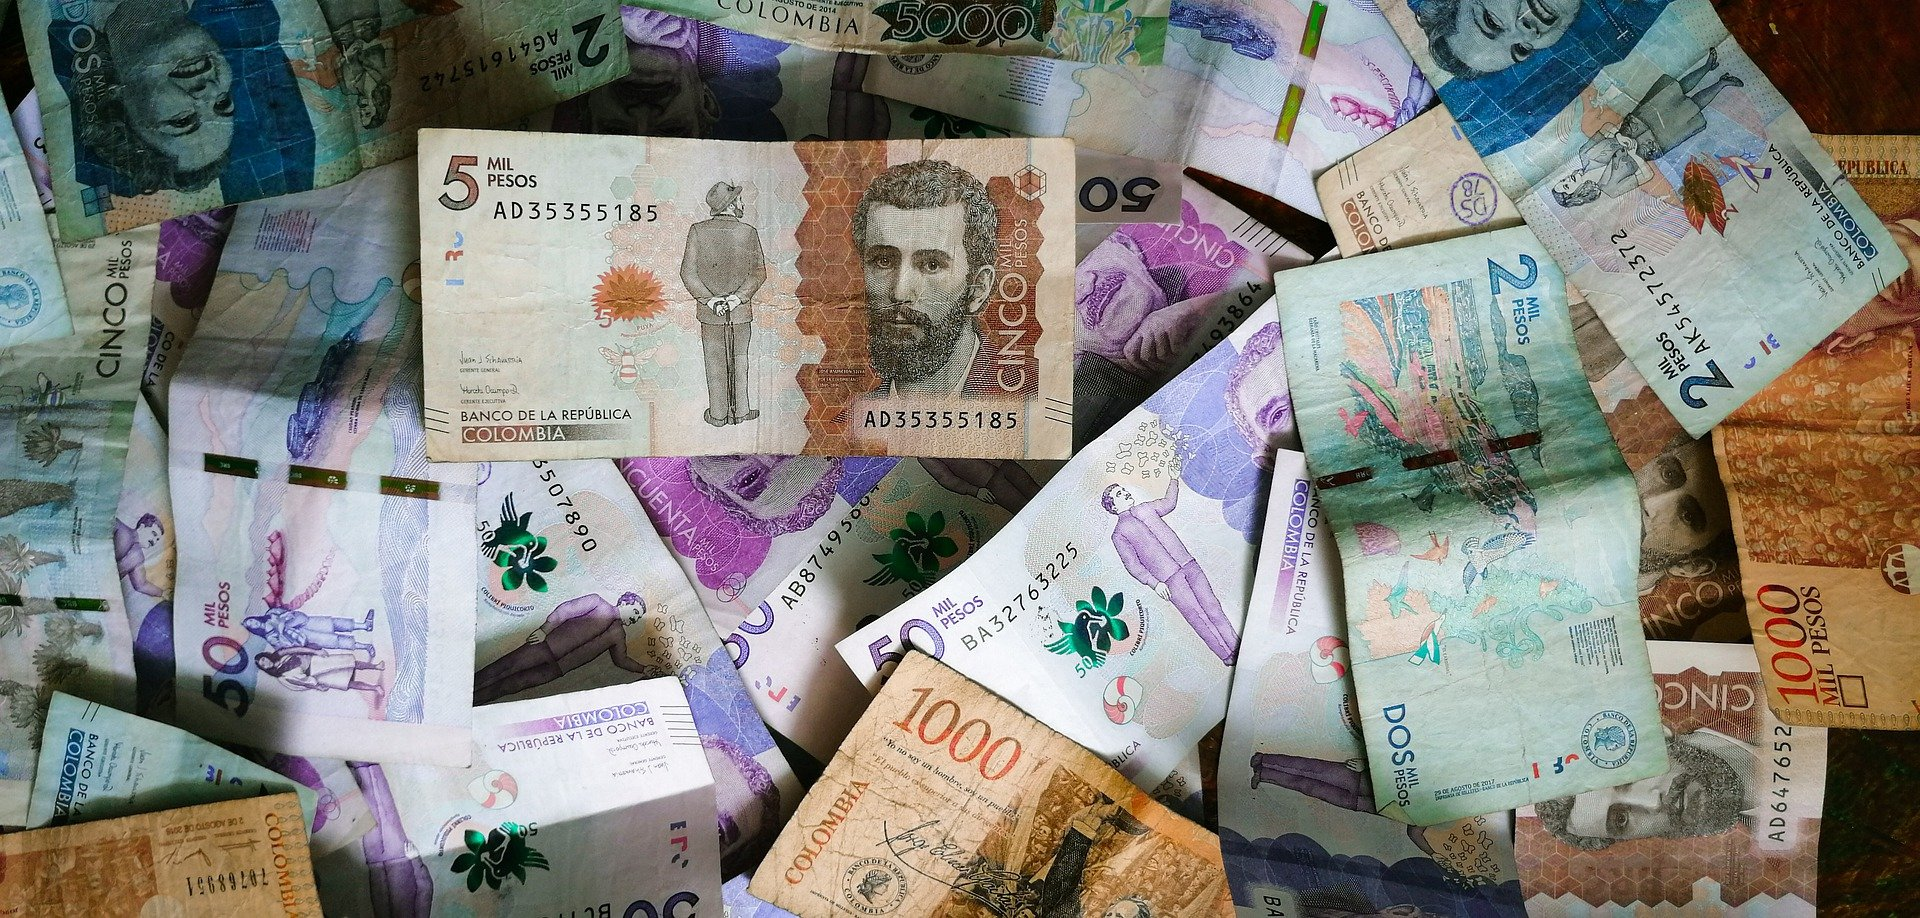 Moneda colombiana